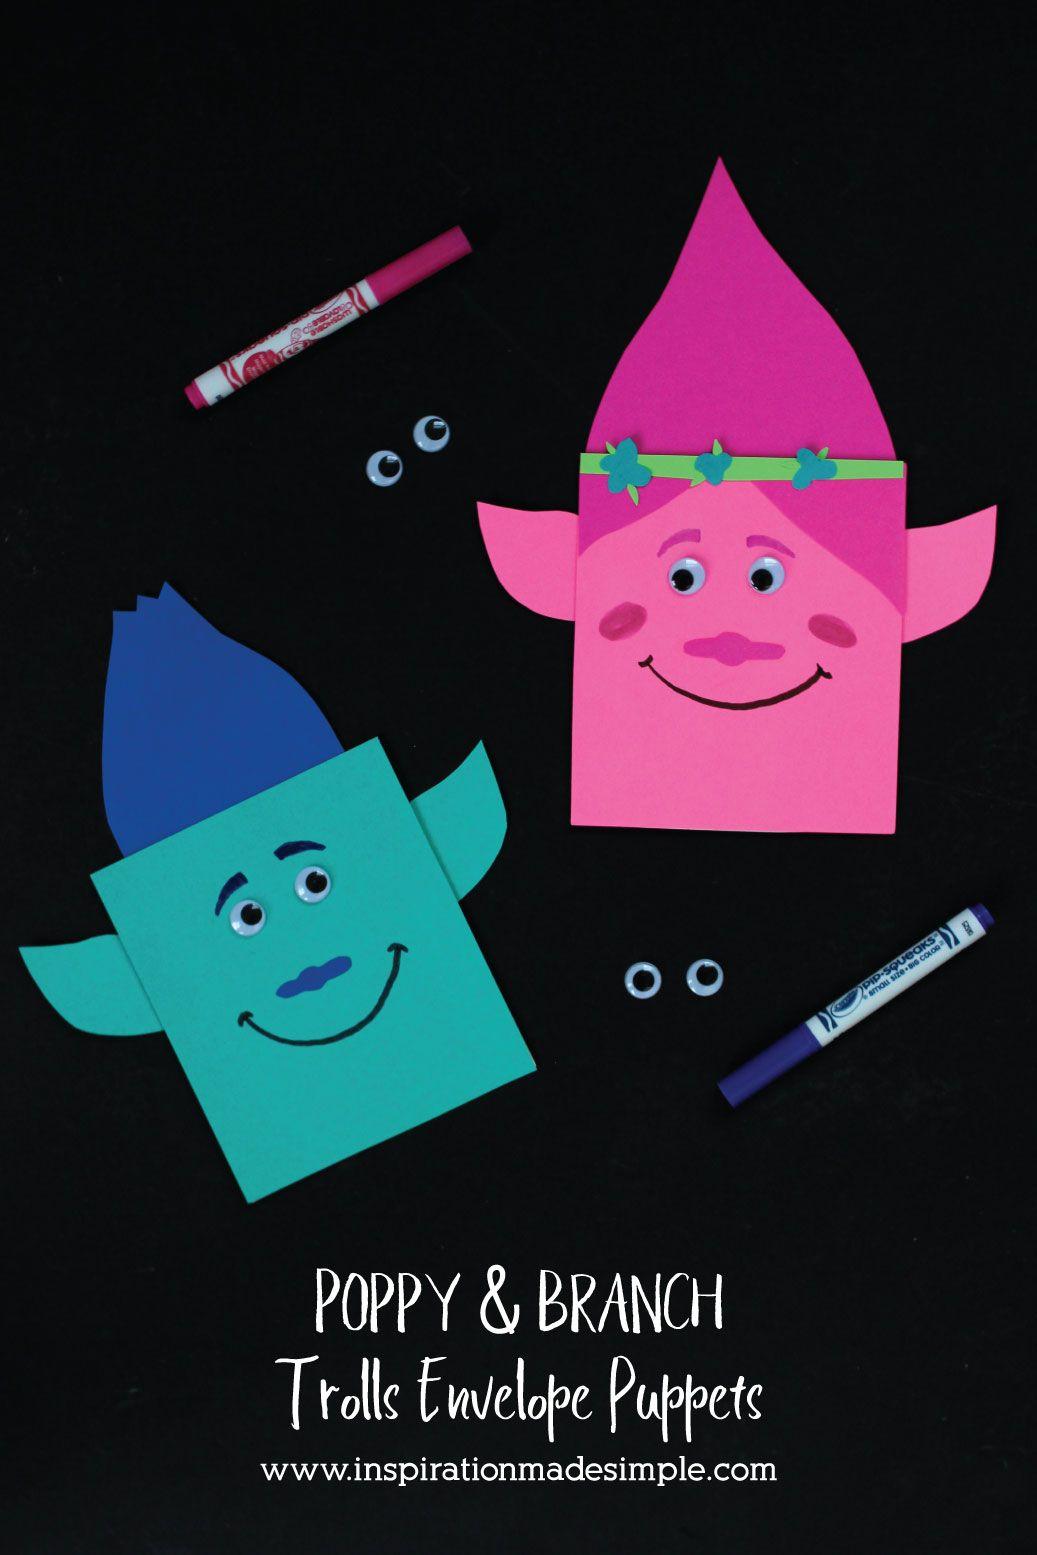 Poppy and Branch Trolls Envelope Puppets Kids Craft